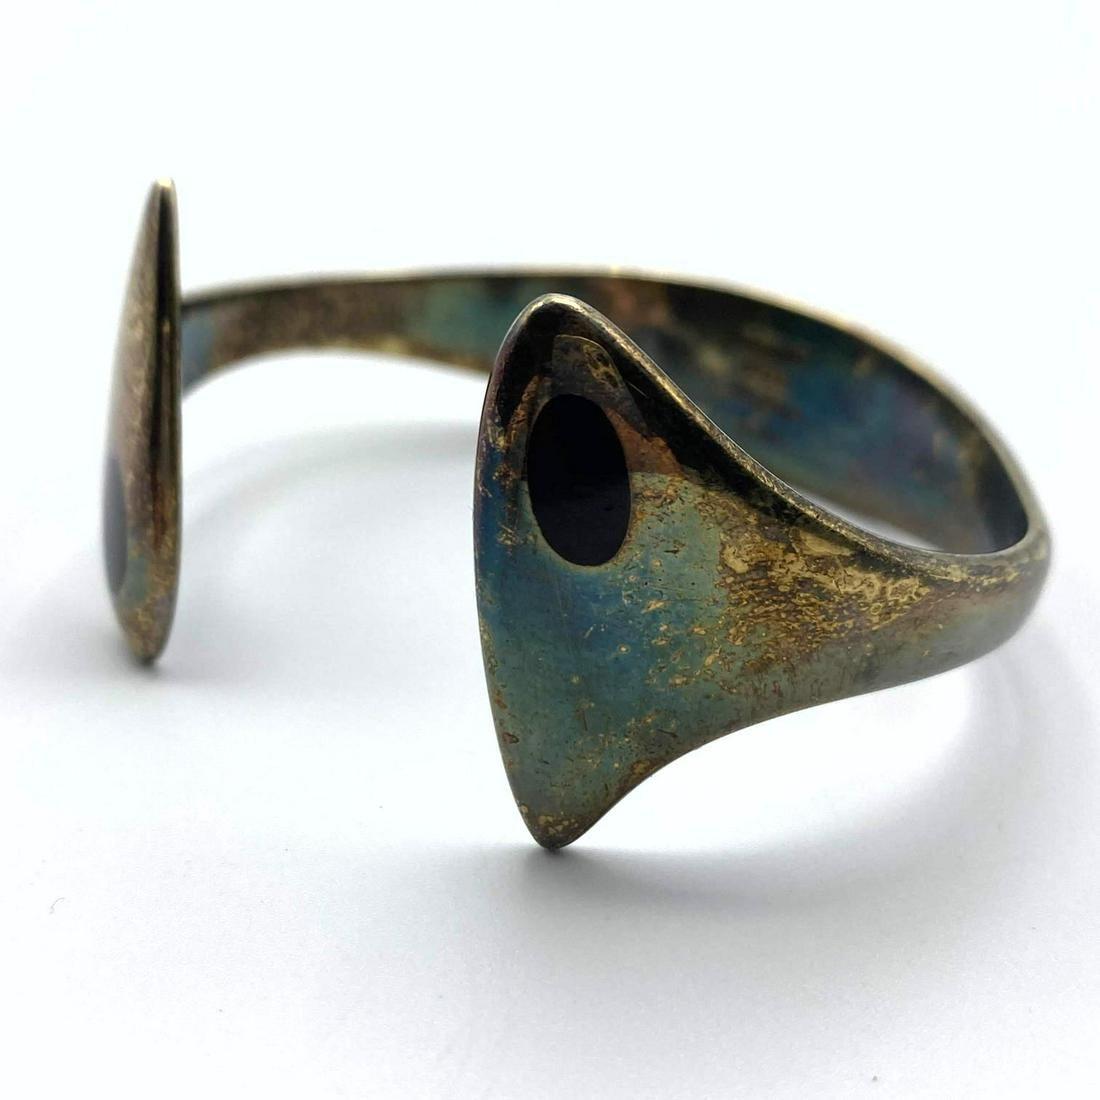 HANS HANSEN # 213E Sterling Silver Cuff Bracelet. Mode